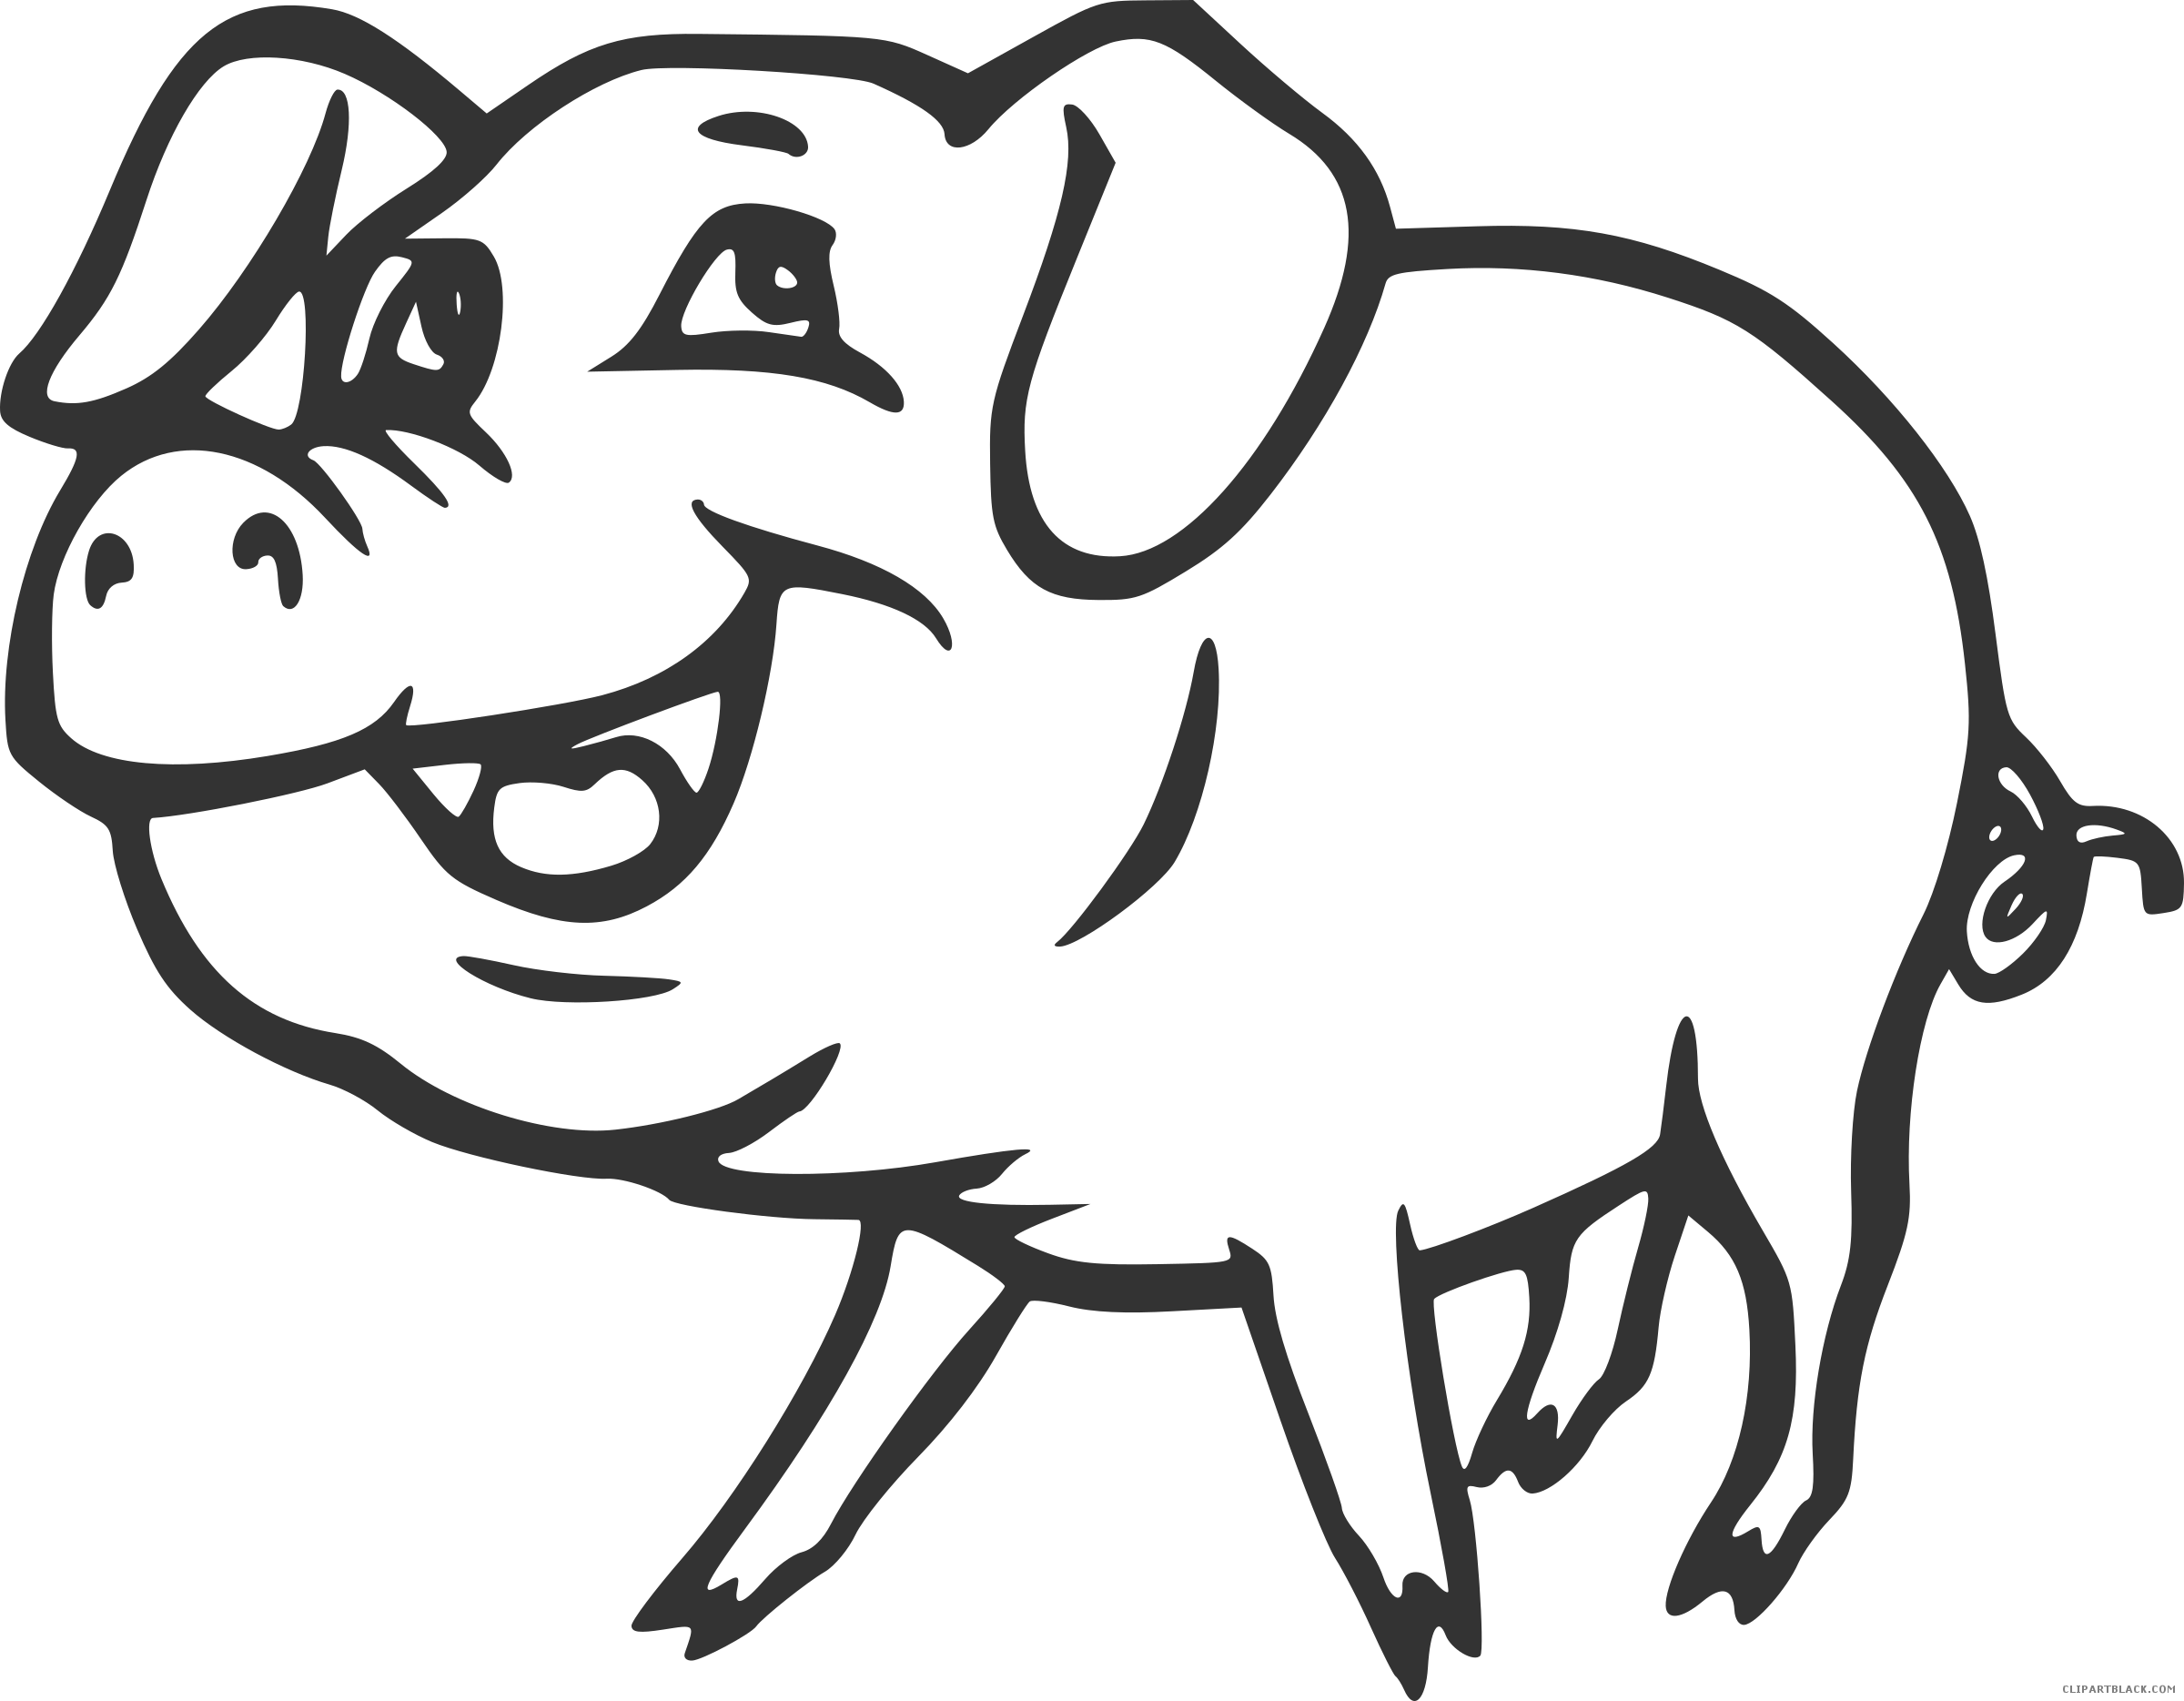 Page of clipartblack com. Clipart pig mud